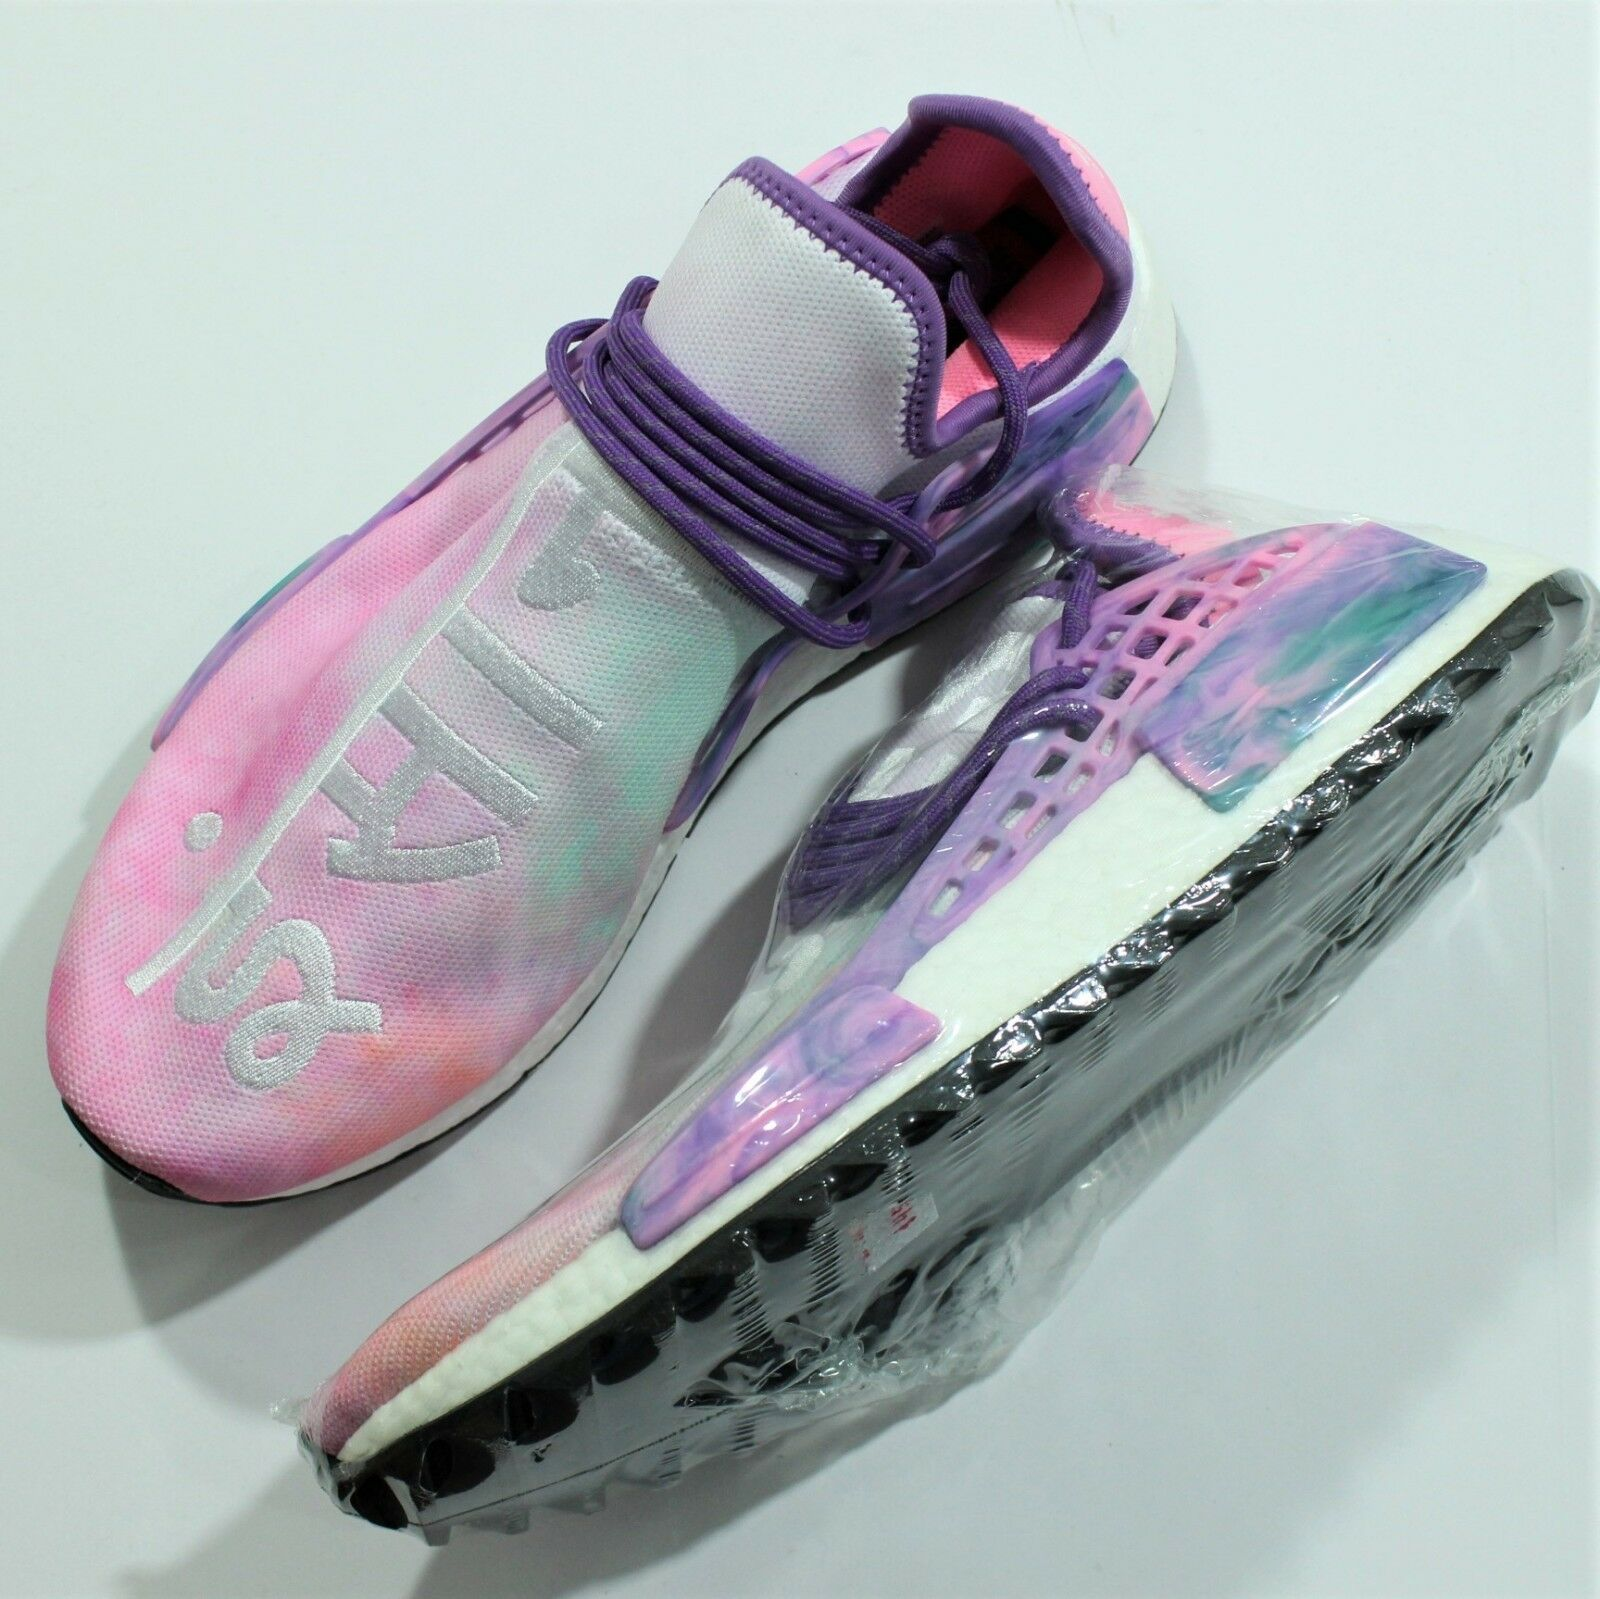 Authentic Adidas Pharrell NMD Hu Holi AC7362 SZ 12.5 Men's